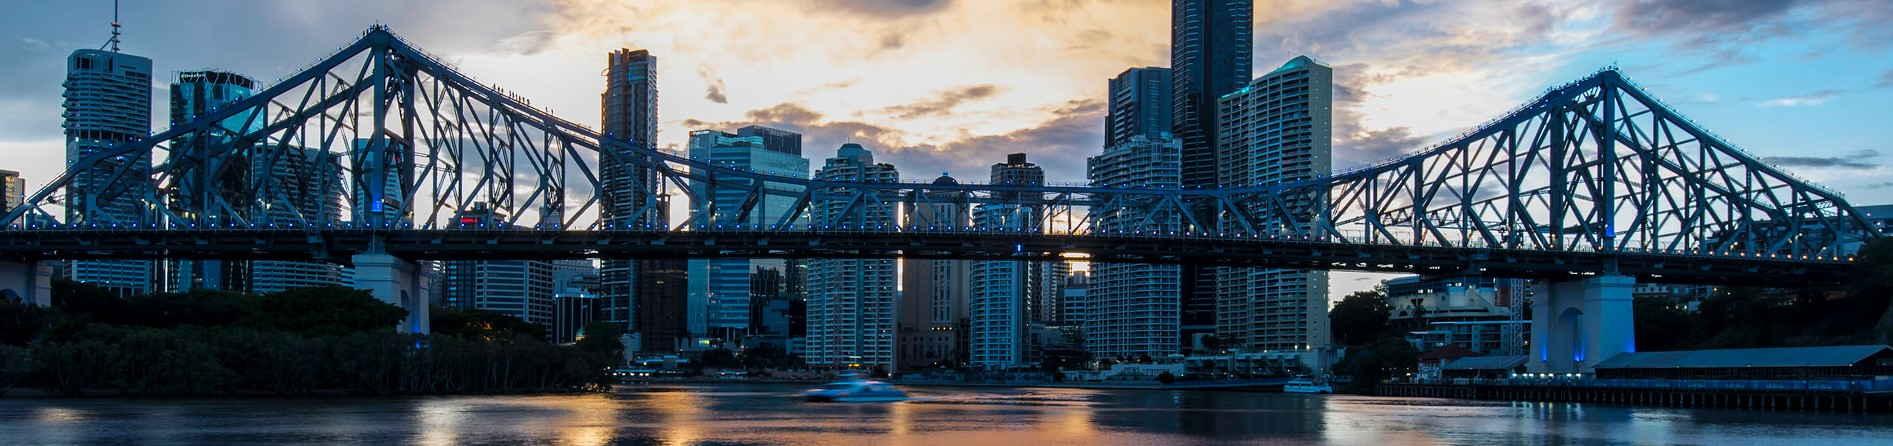 Is Brisbane worth visiting?